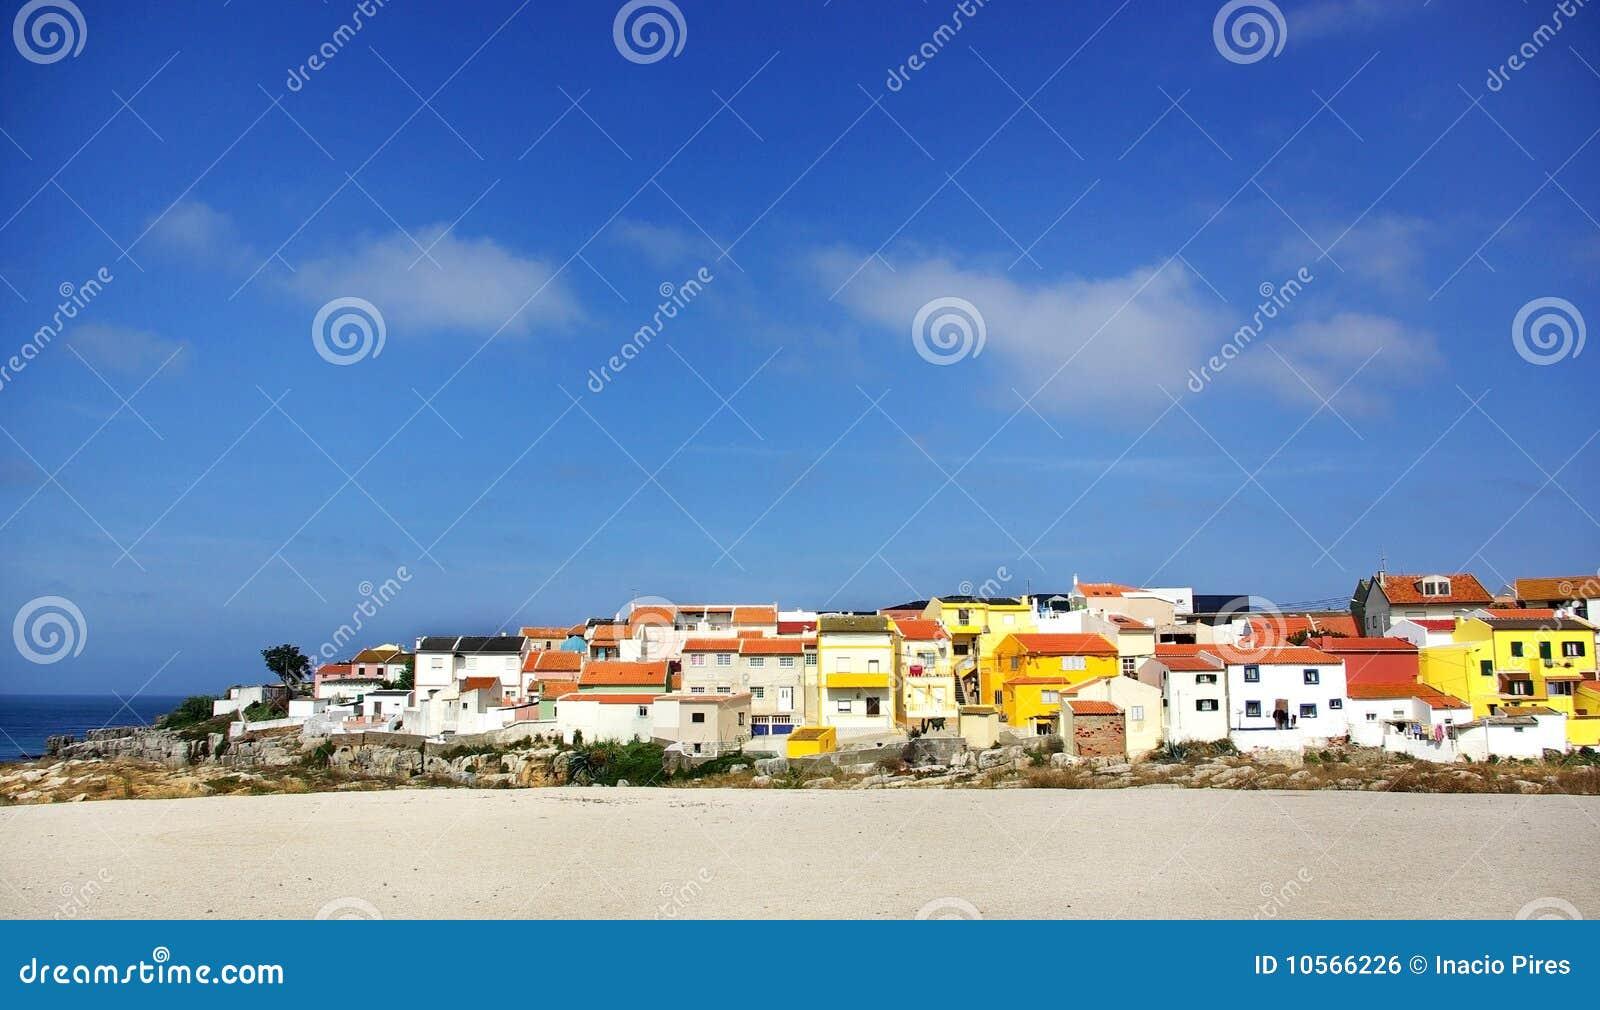 Fishing quarter, Peniche.